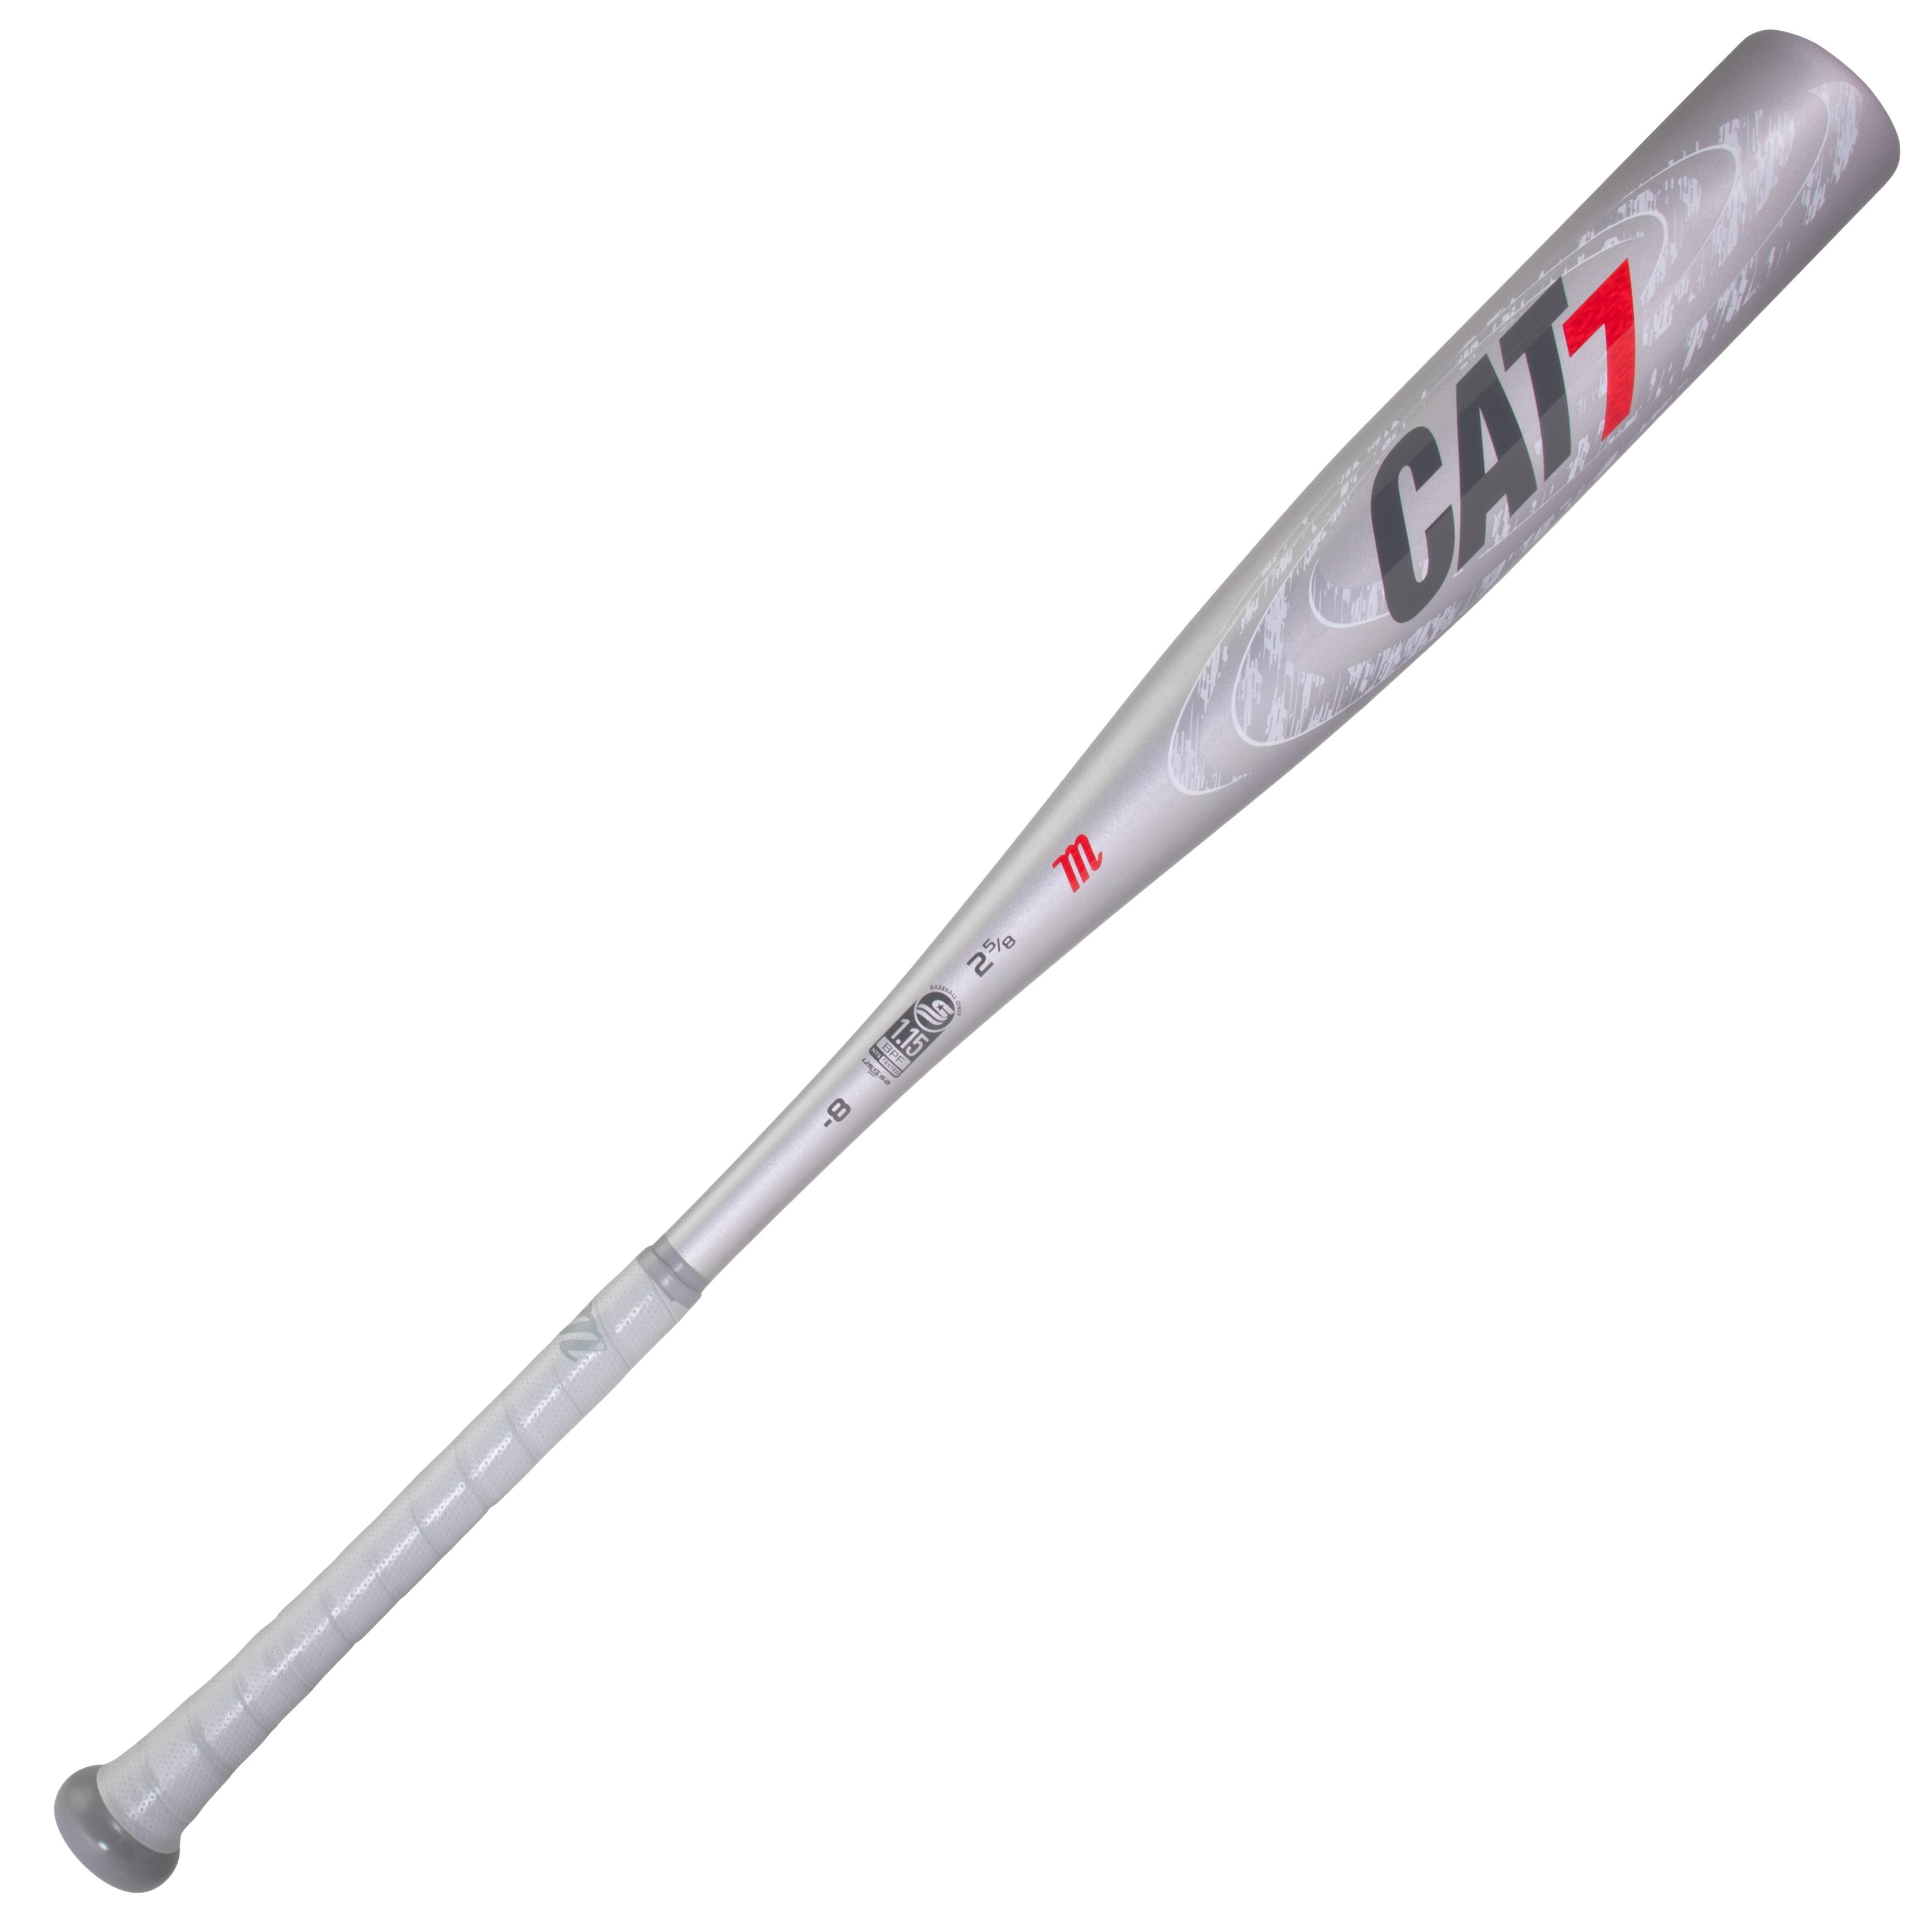 marucci-cat7-silver-8-baseball-bat-30-inch-22-oz MSBC728S-3022